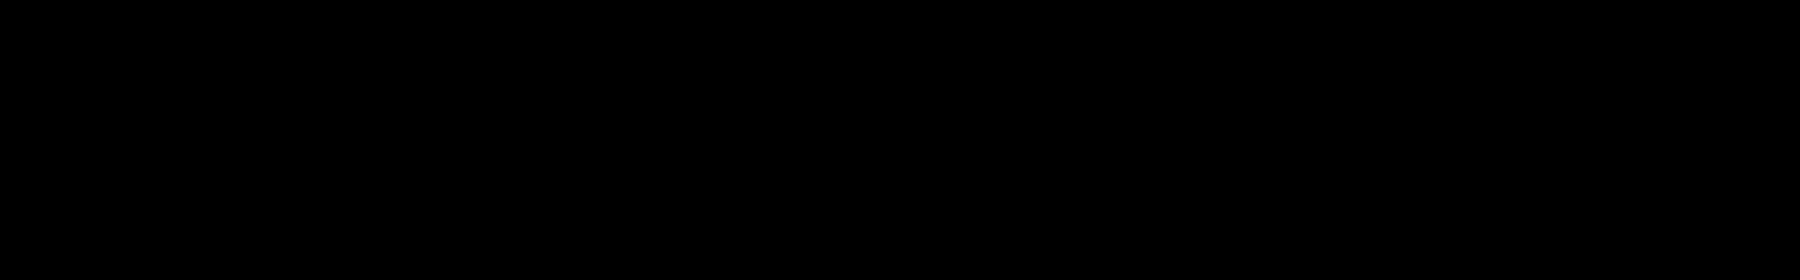 Dream - 3 Melodic Techno Ableton Live Templates audio waveform